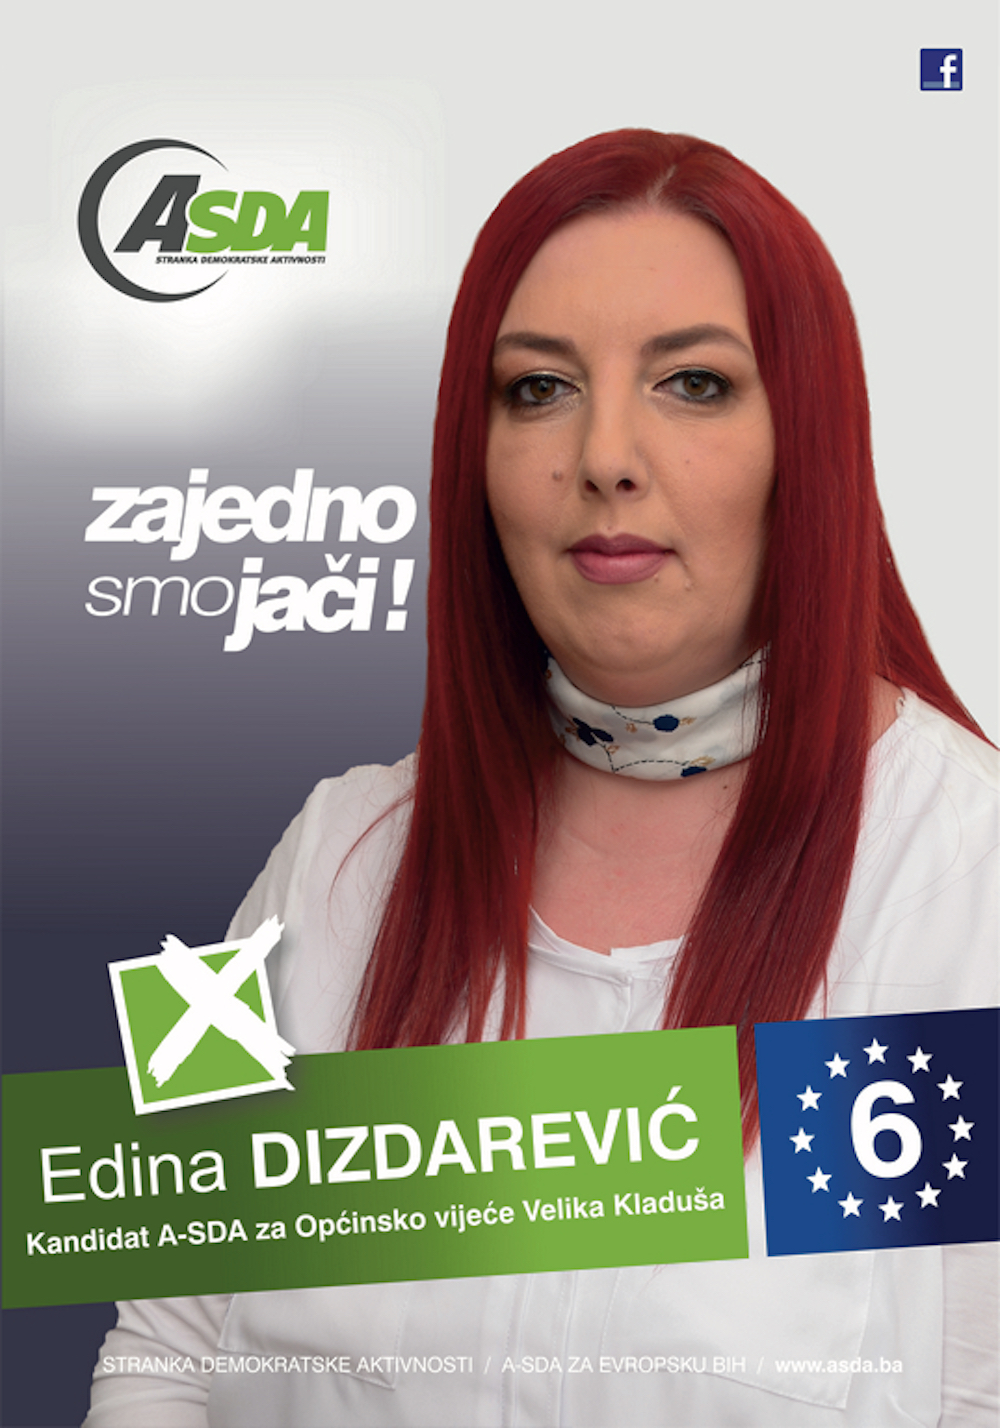 Edina Dizdarević